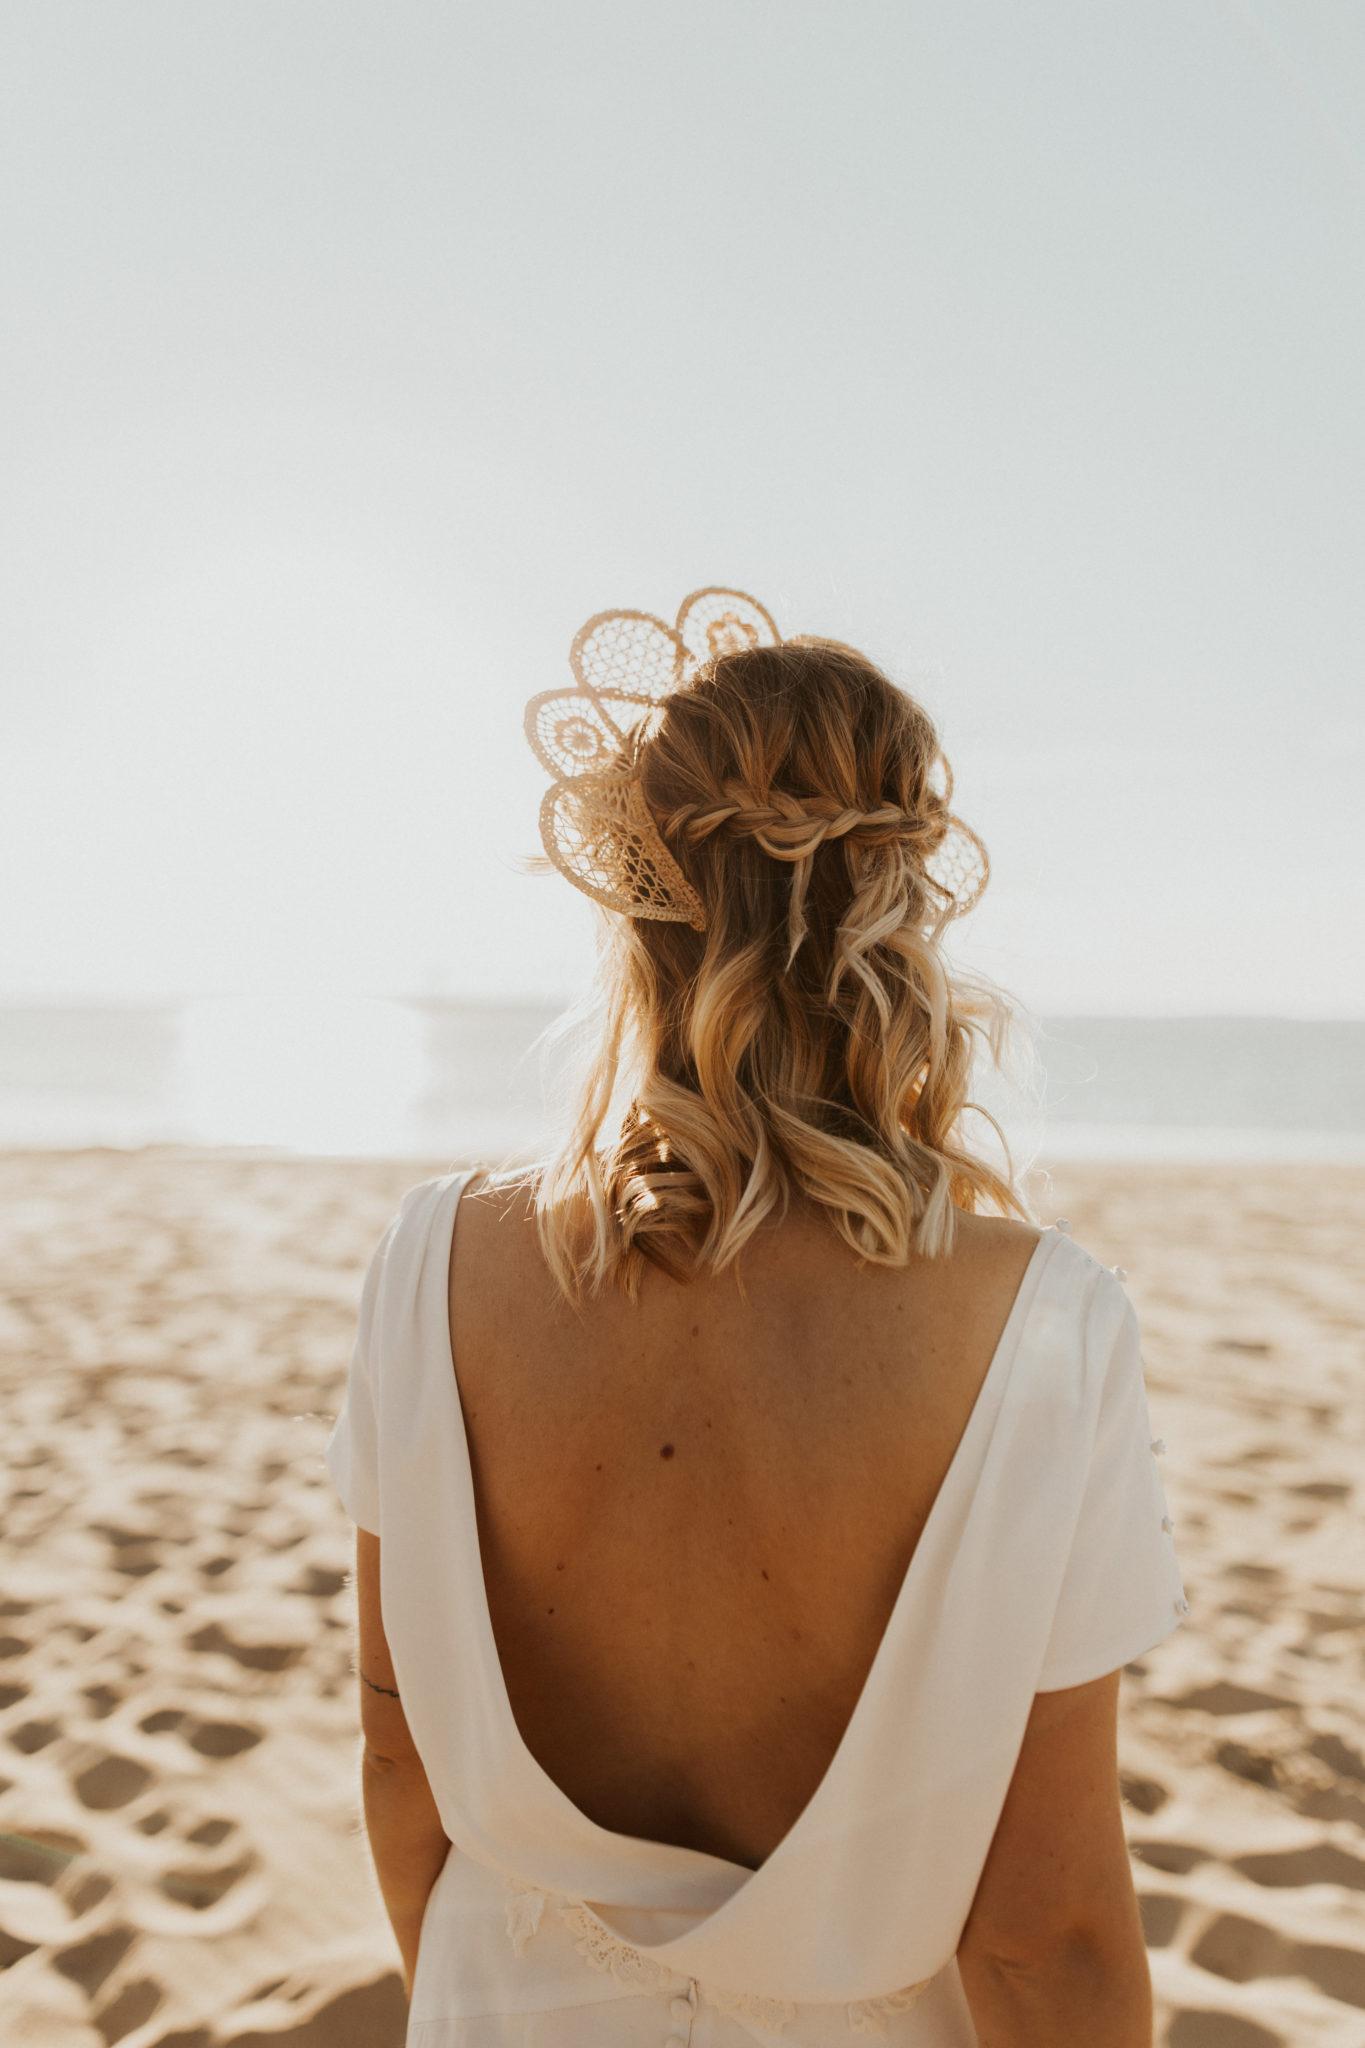 bassin-arcachon-mariage-inspiration-boheme-plage